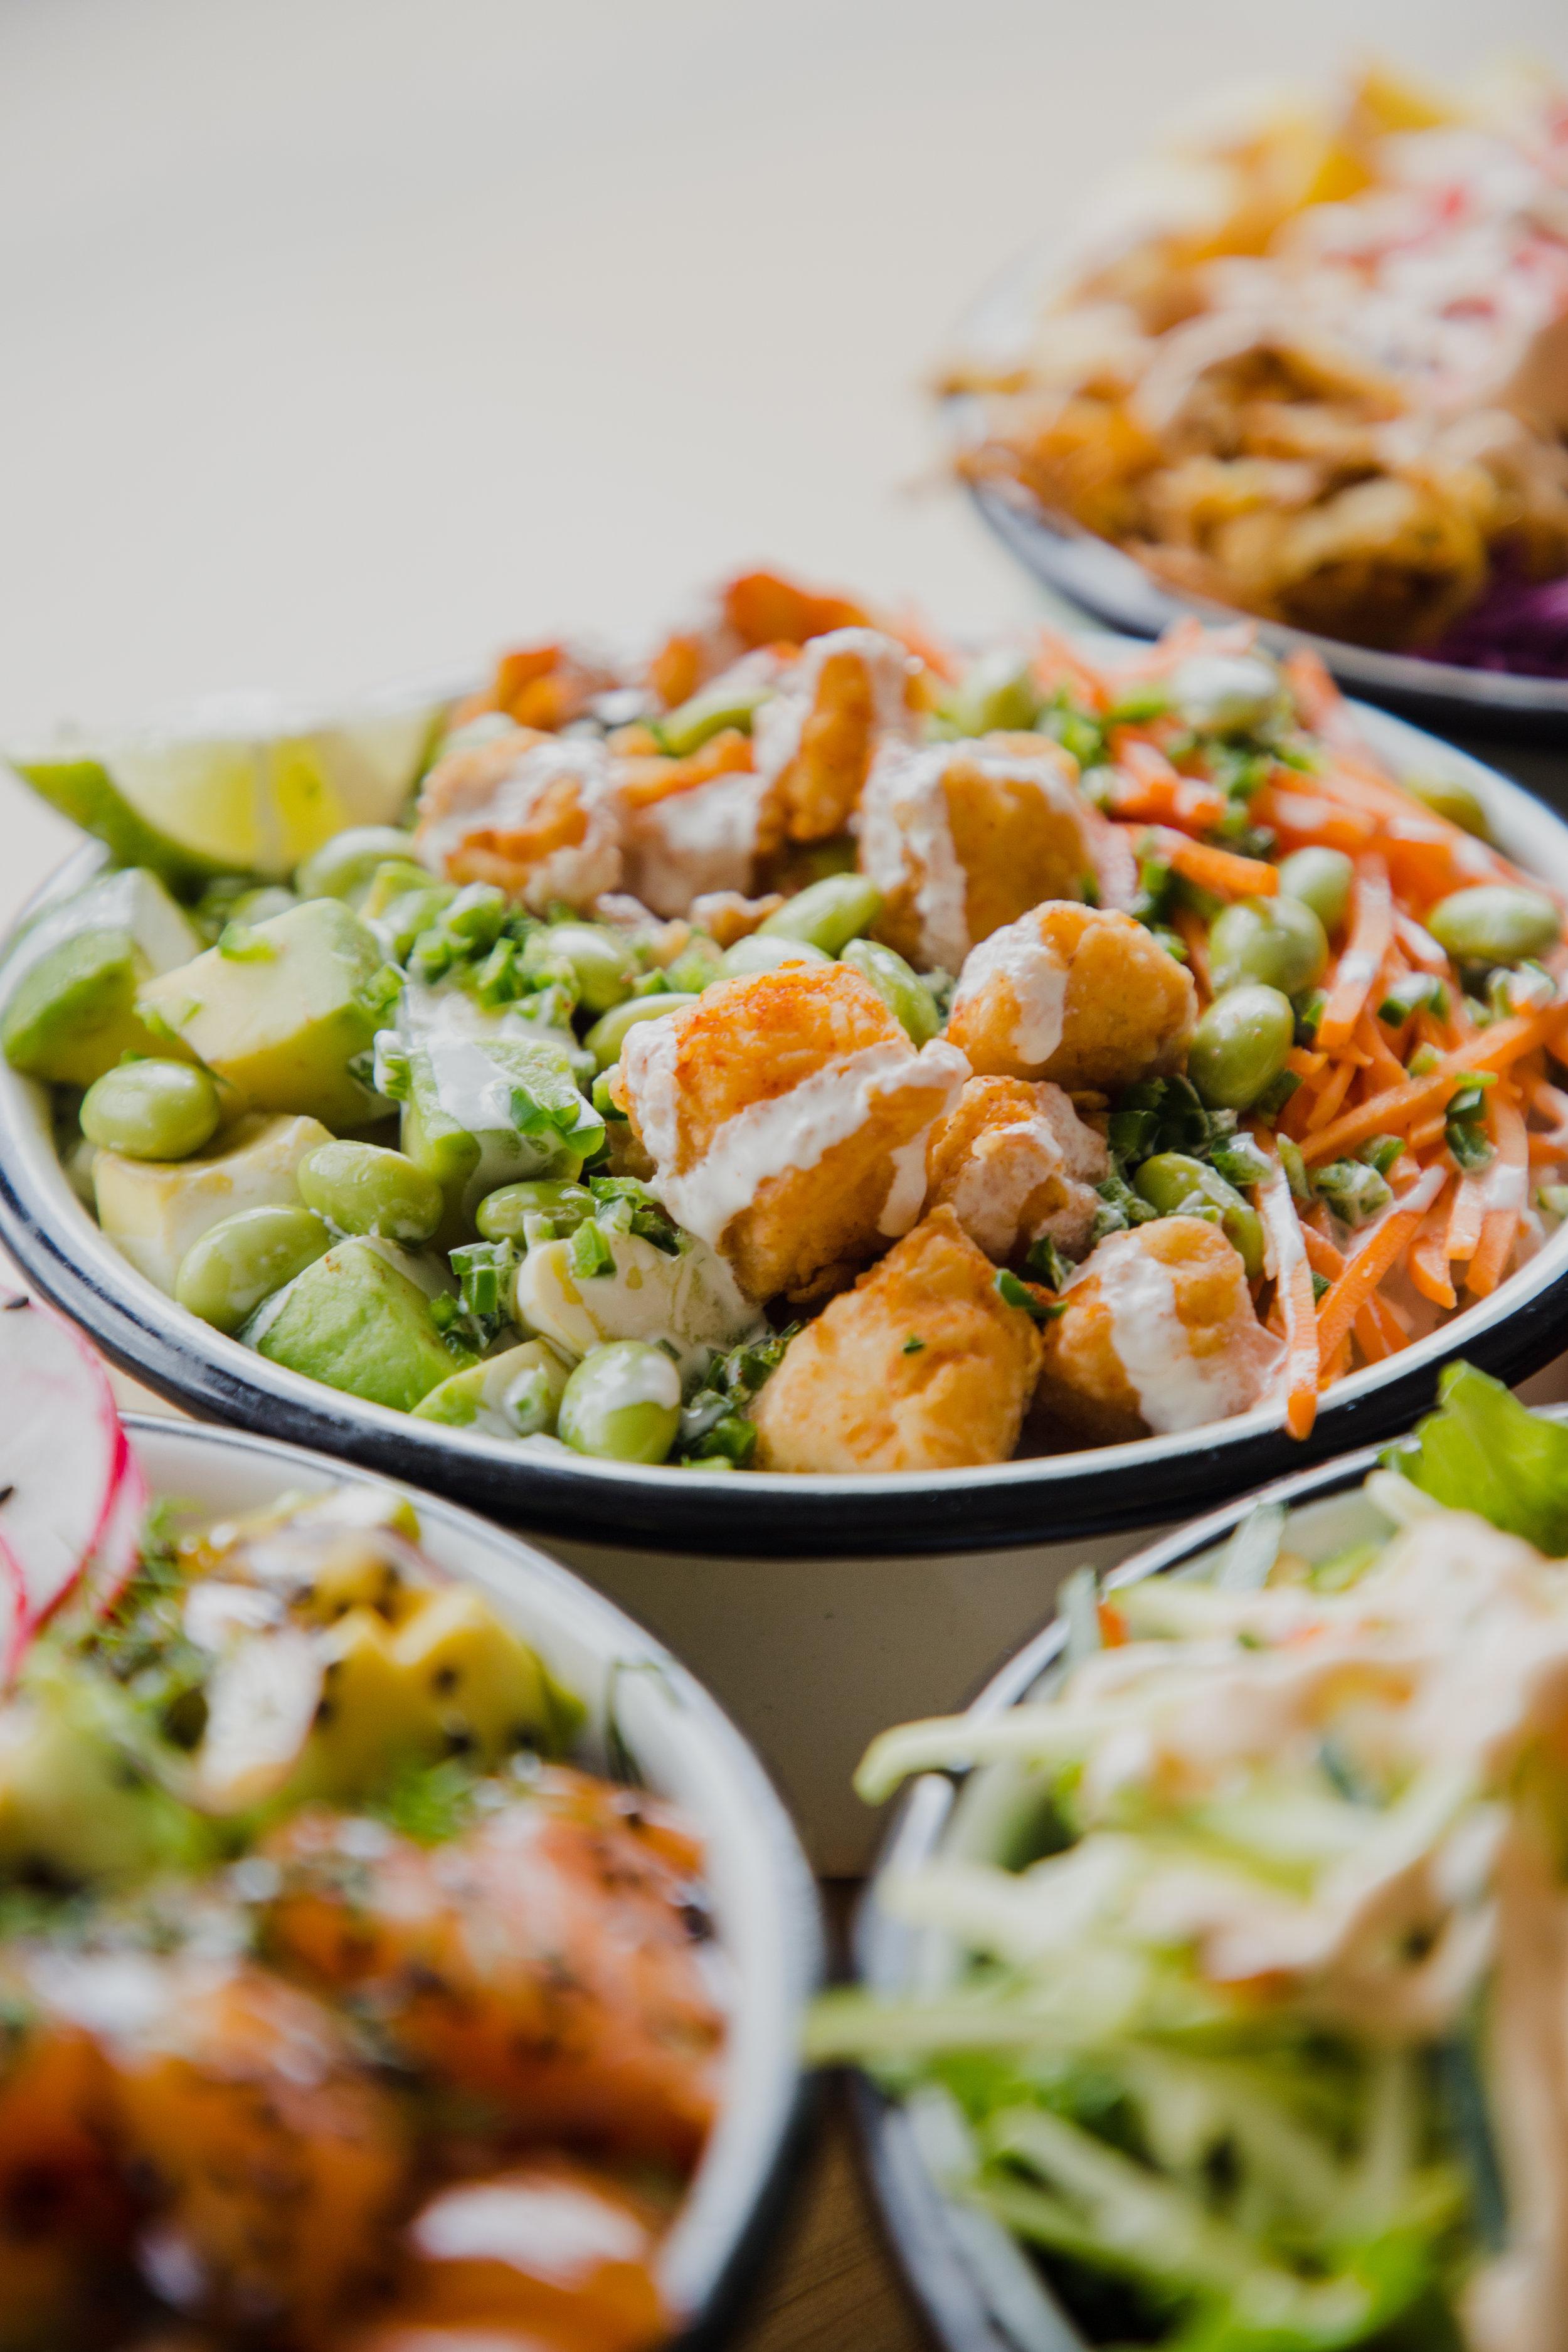 - BASES x 1Arroz de sushi, mix greens, quinoa, arroz integral, arroz con coco.PROTEÍNAS x 1Atún, salmón, pescado blanco, tofu, palmito de cangrejo, pollo a la plancha, camarones salteados, pescado apanado, cerdo desmechado.MIX-INS x 2Aguacate, pepino, mango, zucchini noodles, zanahoria, repollo, cascos de naranja, maíz tierno.TOPPINGS x 2Maní, ajonjolí, cebollín, jalapeño, masago, cilantro, edamames, cebolla morada, gari rosado, cebolla crunch, maíz peruano, pimentón, rábano, seaweed salad, veggie tempura.SALSAS x 1Teriyaki, wasabi cream, sriracha mayo, spicy soya, leche de tigre, chipotle mayo.